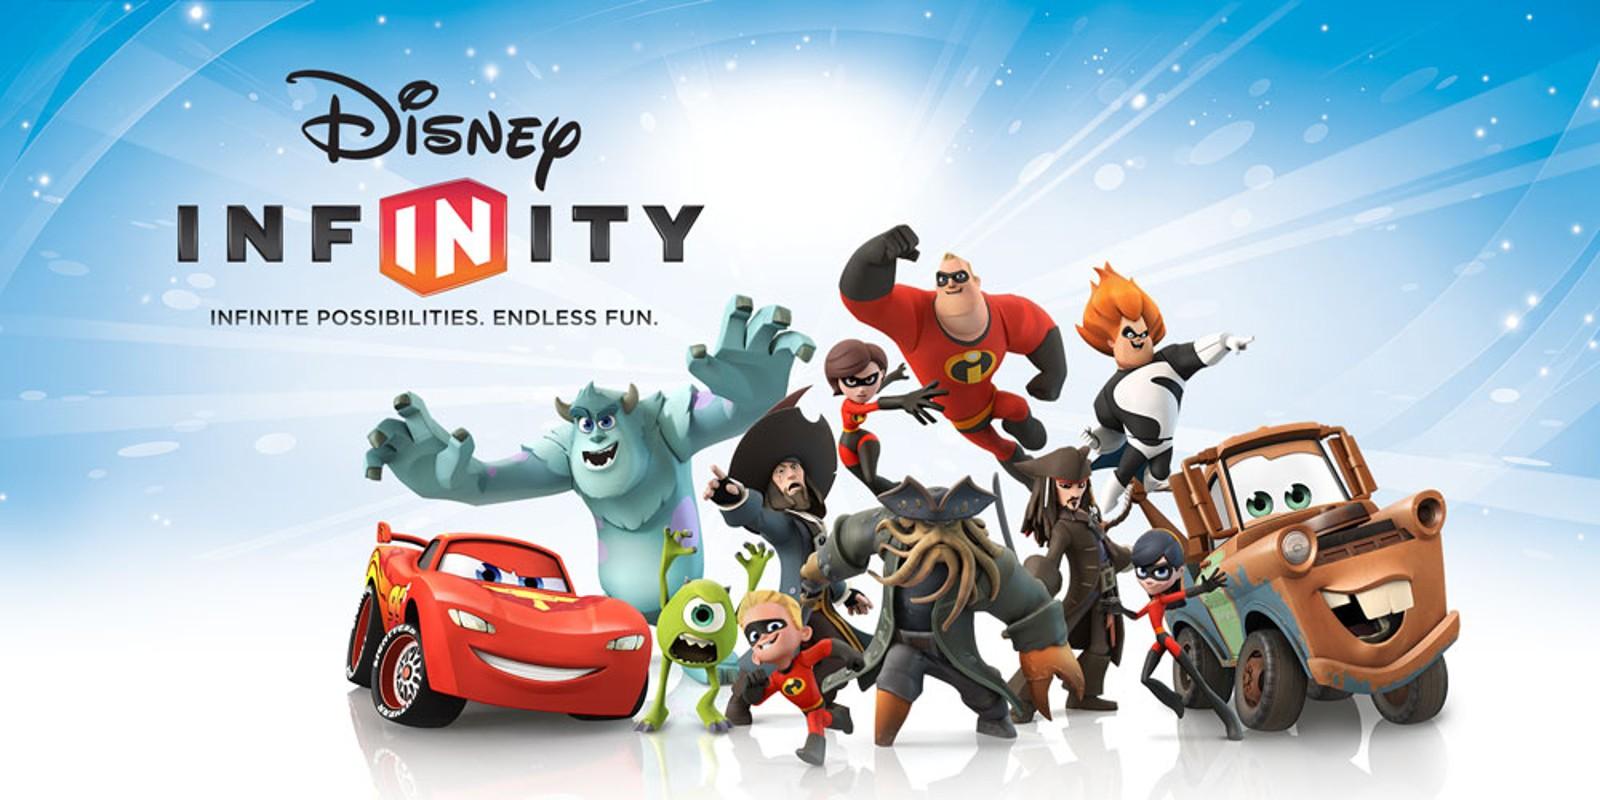 Disney Infinity Videos For Kids